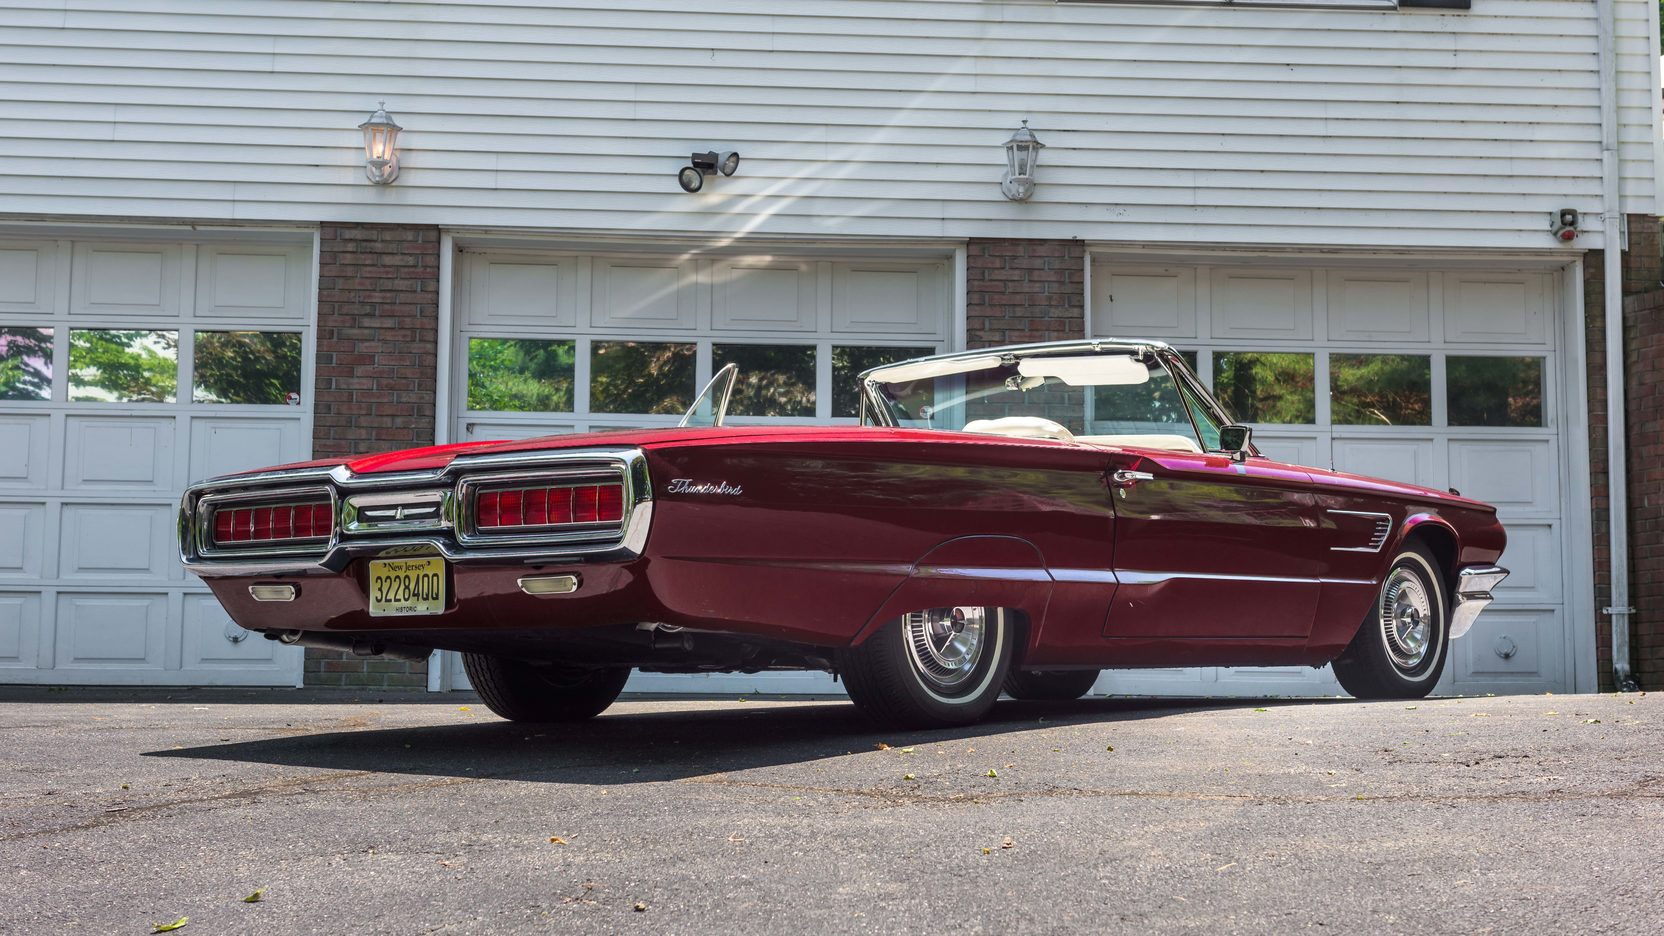 1965 Ford Thunderbird rear 3/4